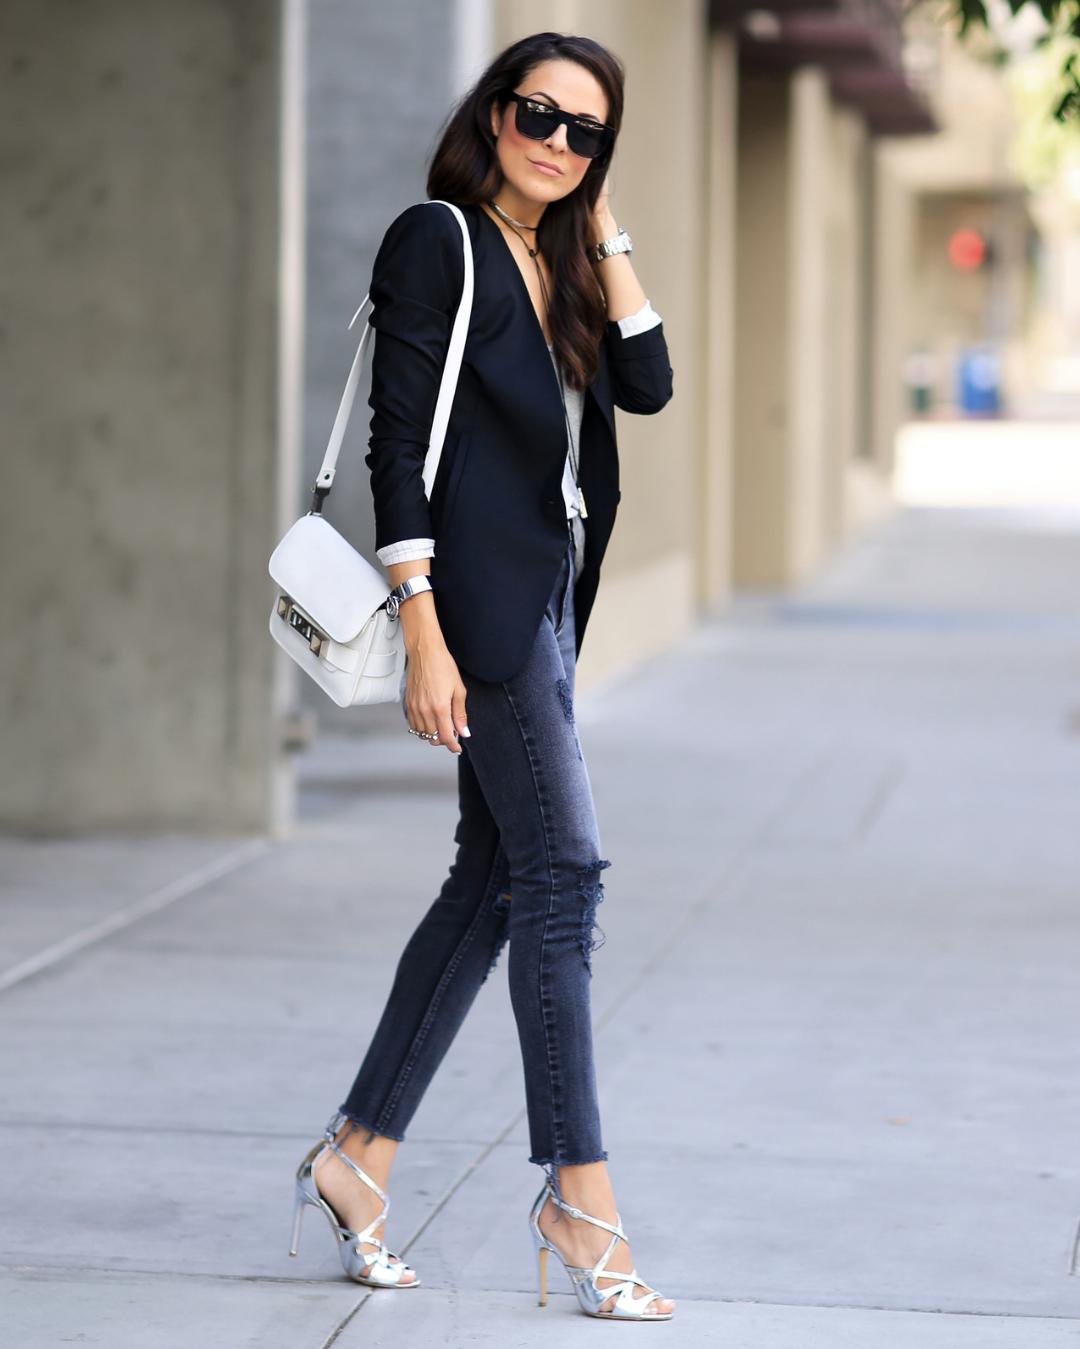 Res-Denim-Madewell-Fashion-BCBG-Proenza-Shouler-Streetstyle-Chloe-Nine-West-Lucys-Whims.jpg